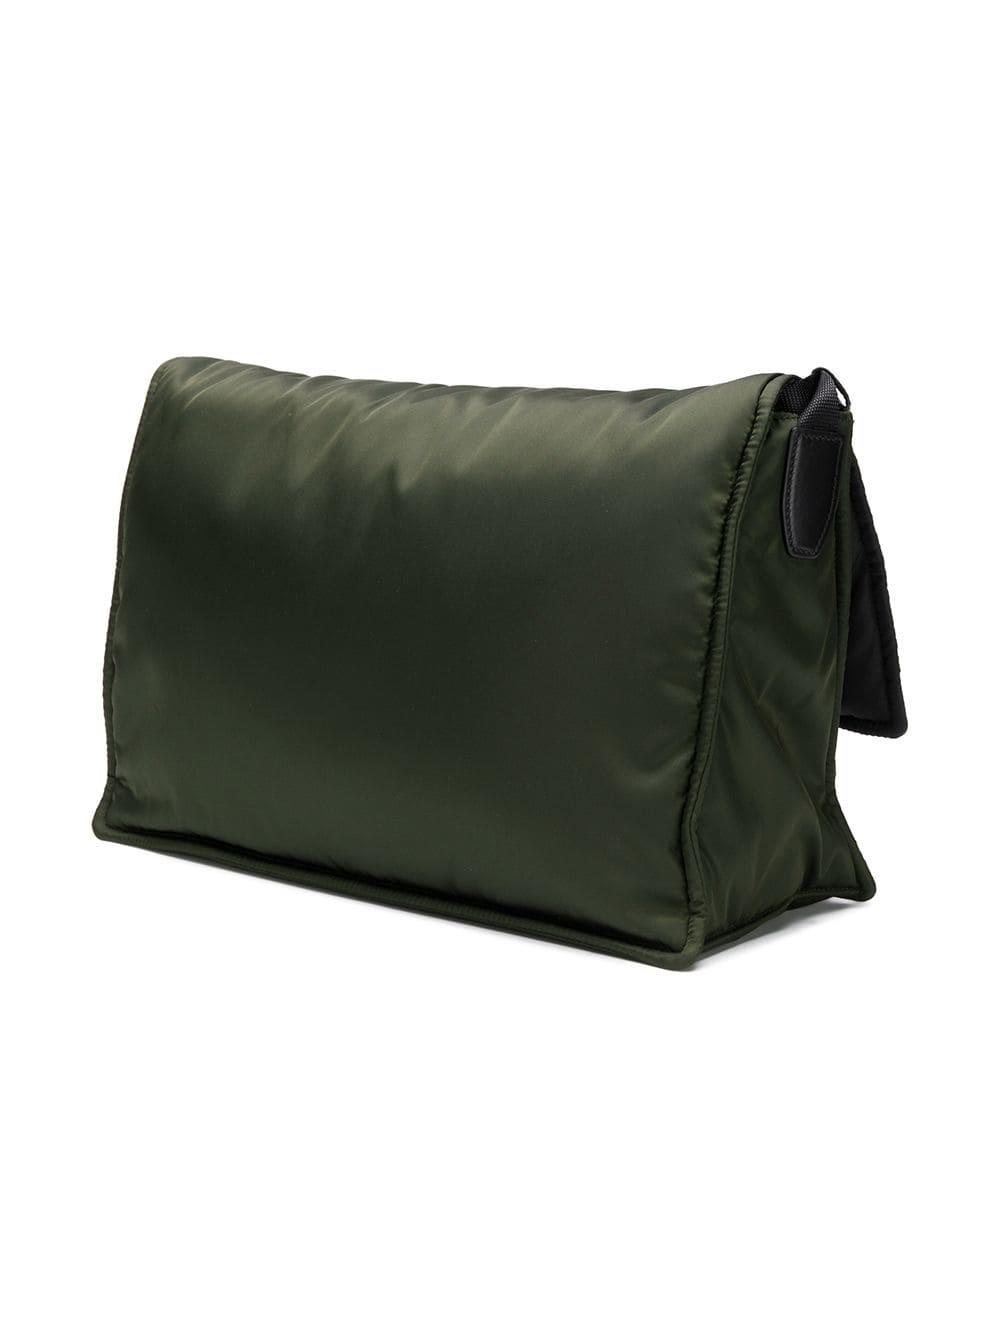 6be22147564f prada NYLON SHOULDER BAG available on montiboutique.com - 24891